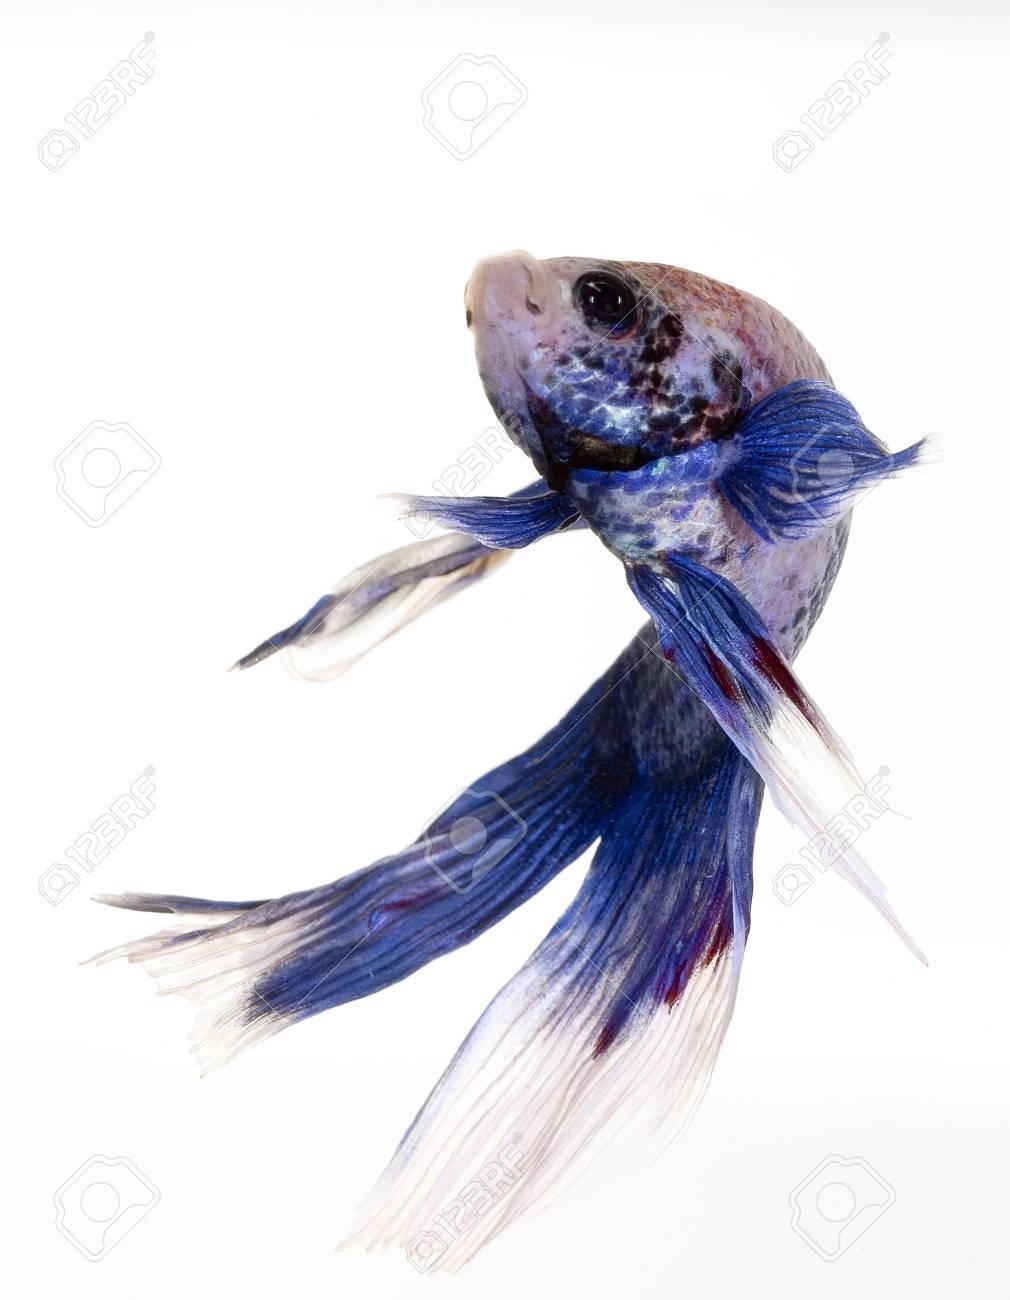 a great asian fish in a tropical aquarium Stock Photo - 3637791